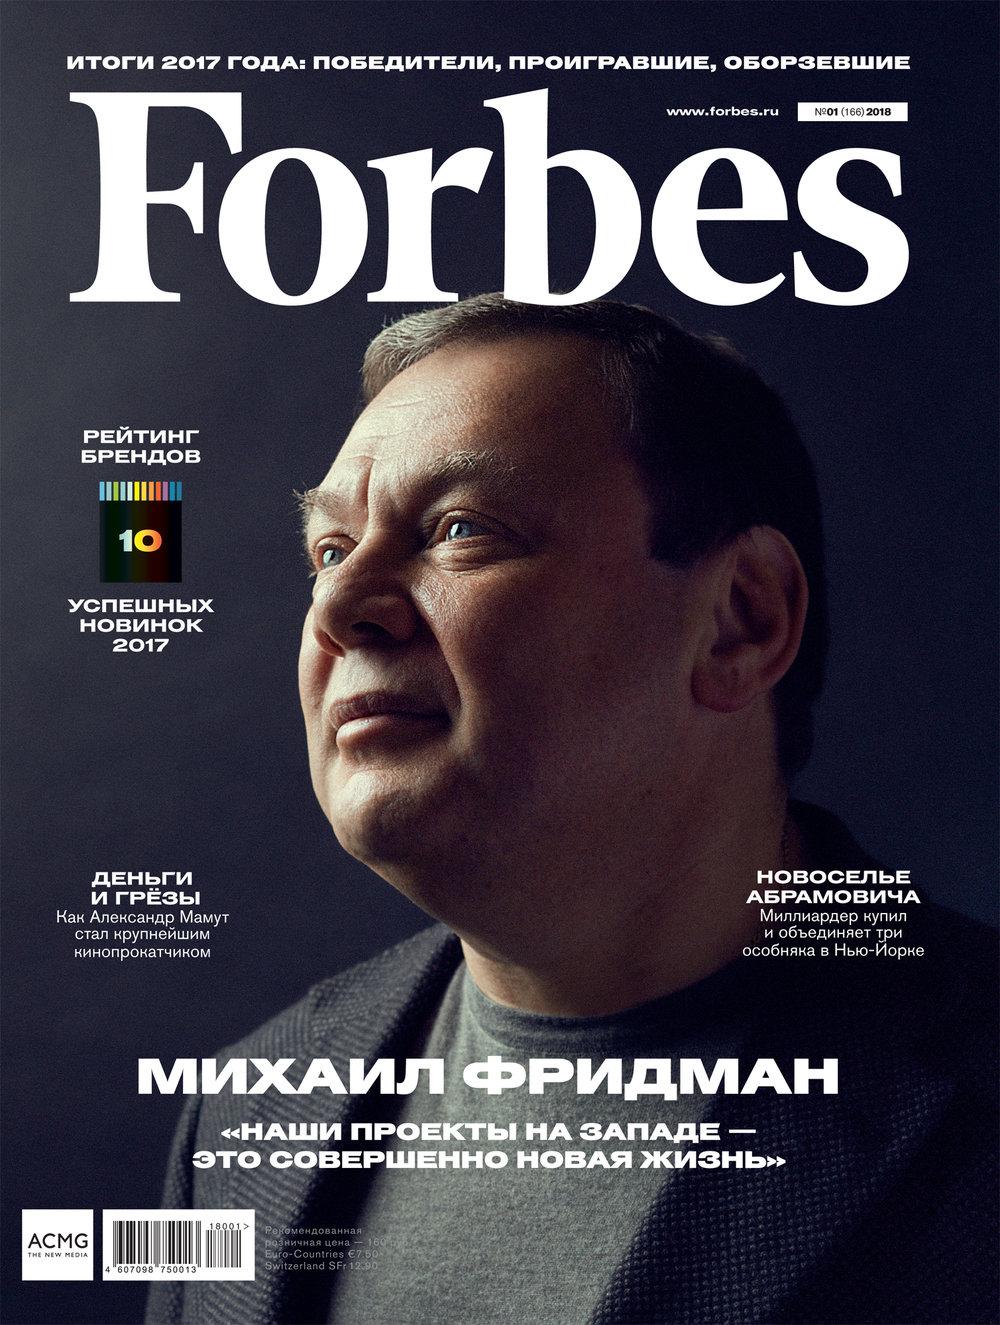 forbes_friedman.jpg